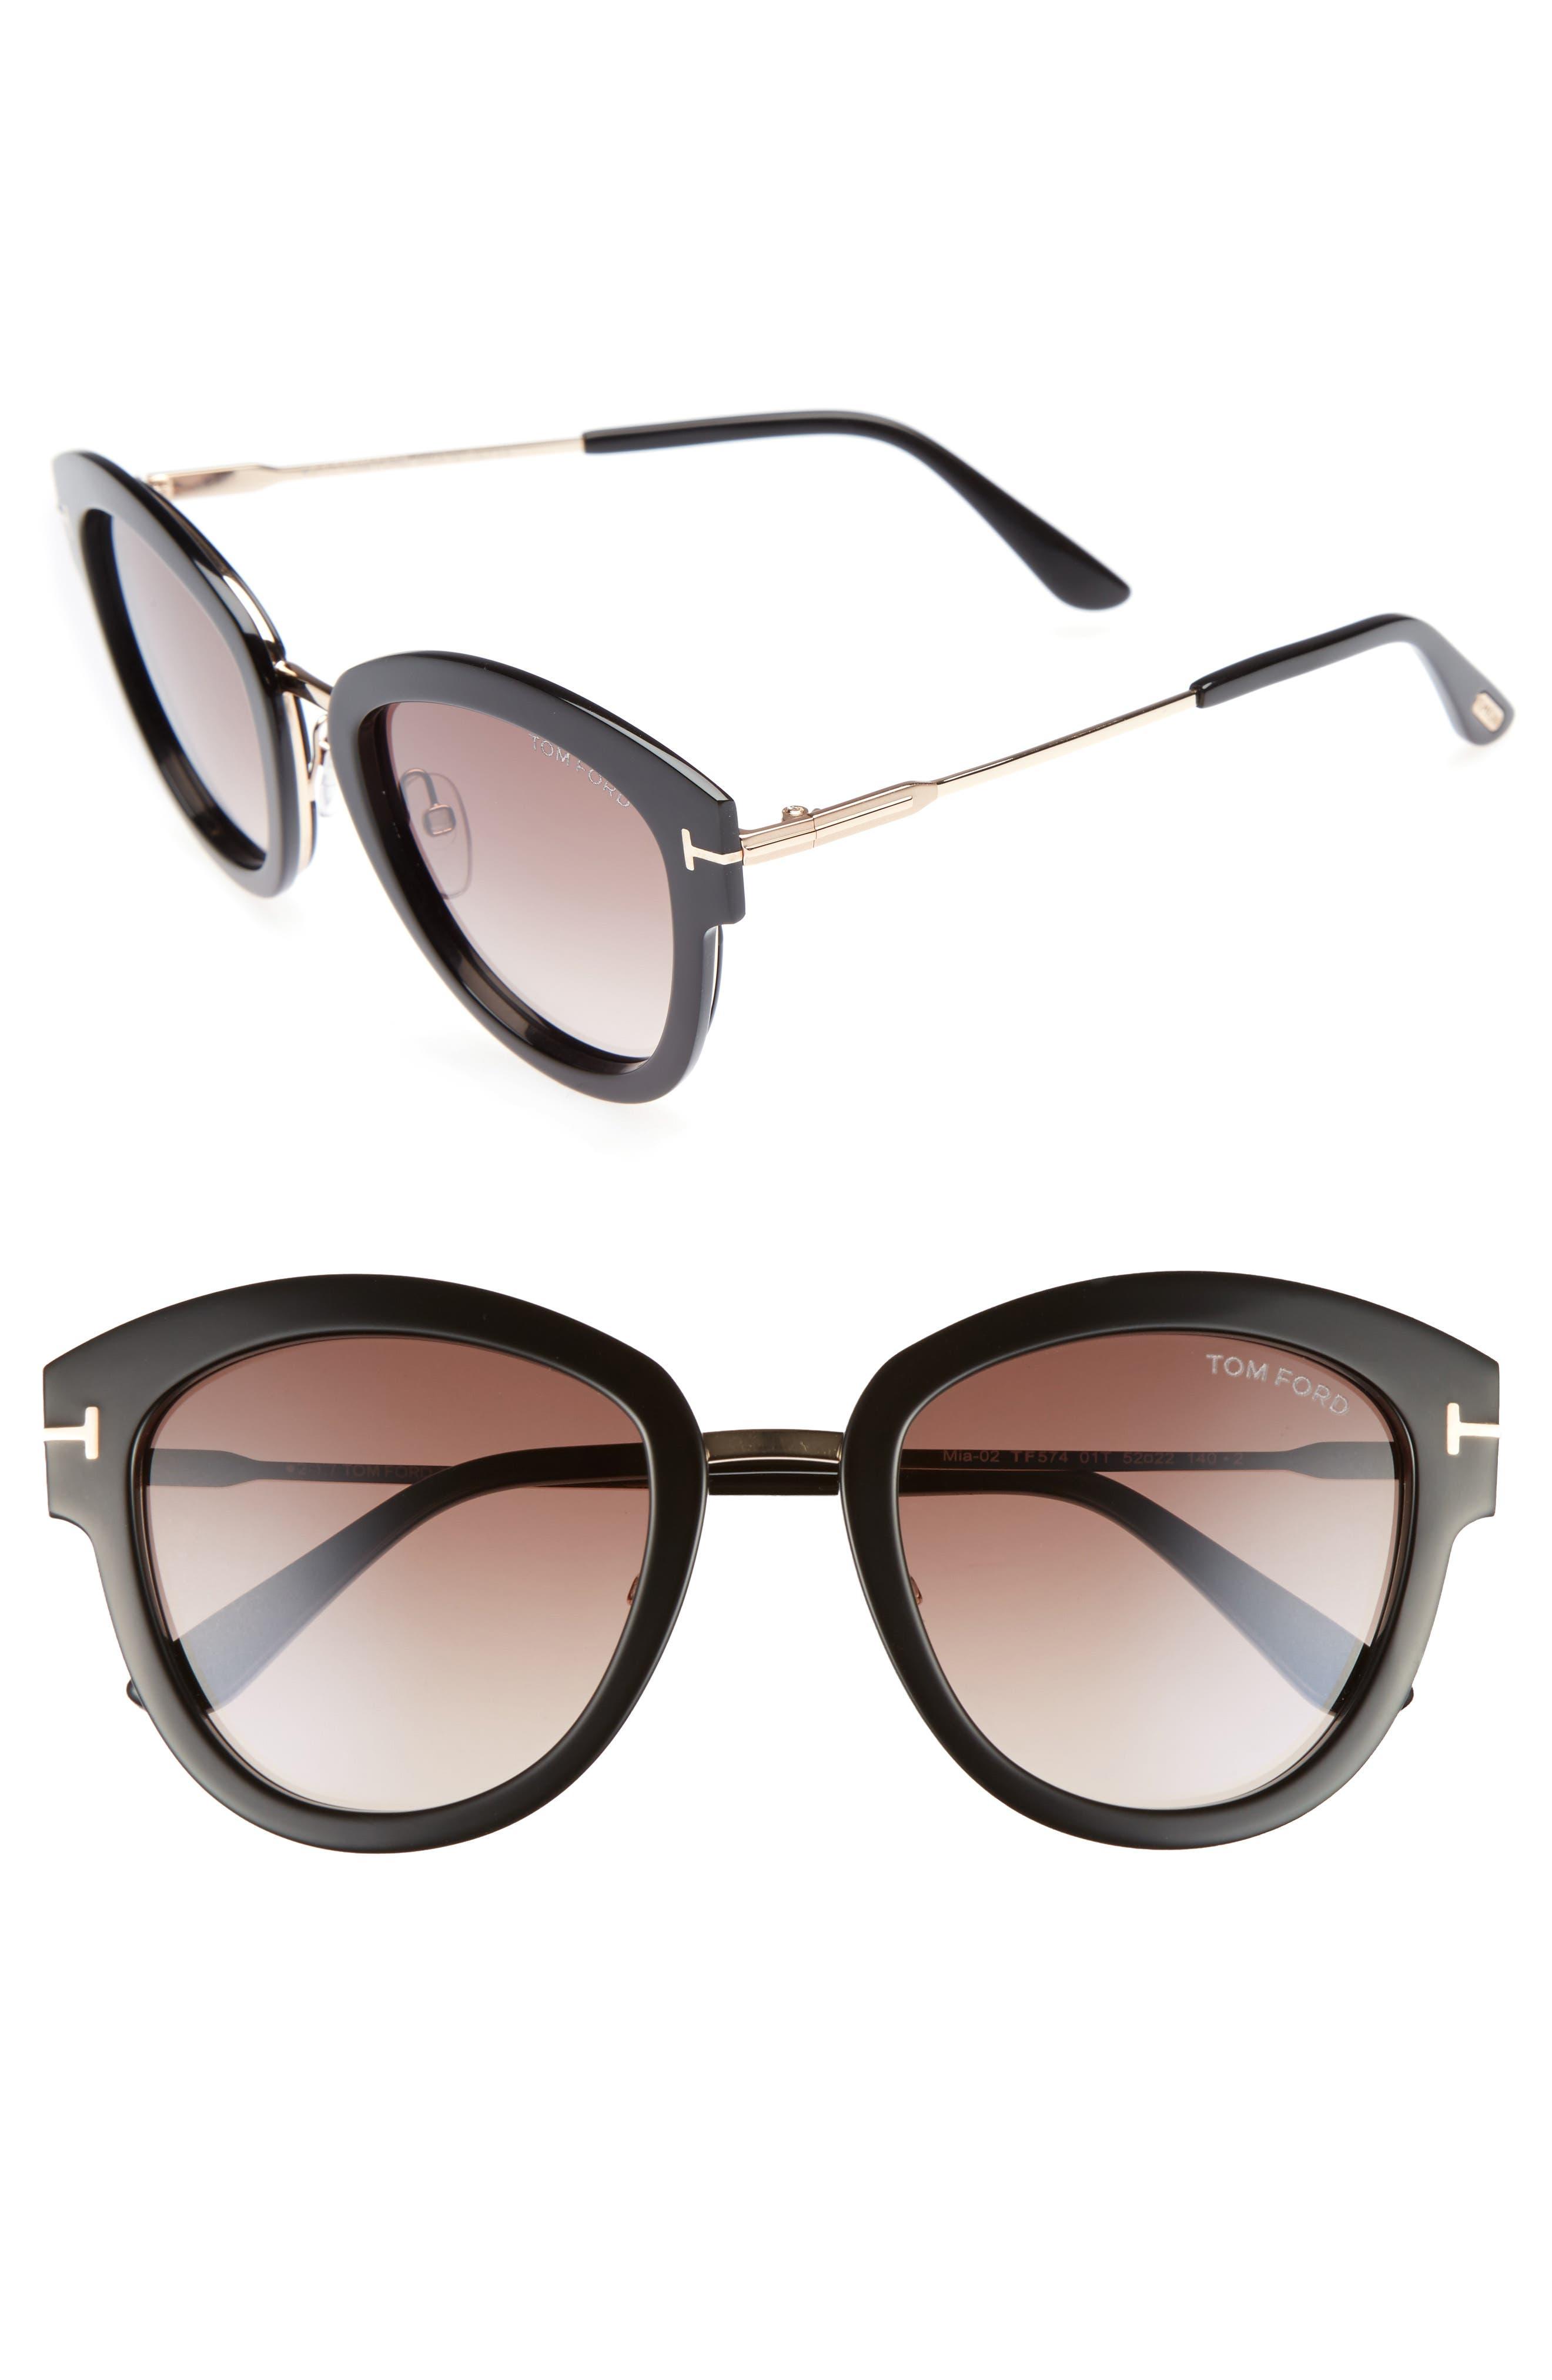 Mia 55mm Cat Eye Sunglasses,                             Main thumbnail 1, color,                             Black Acetate/ Rose Gold